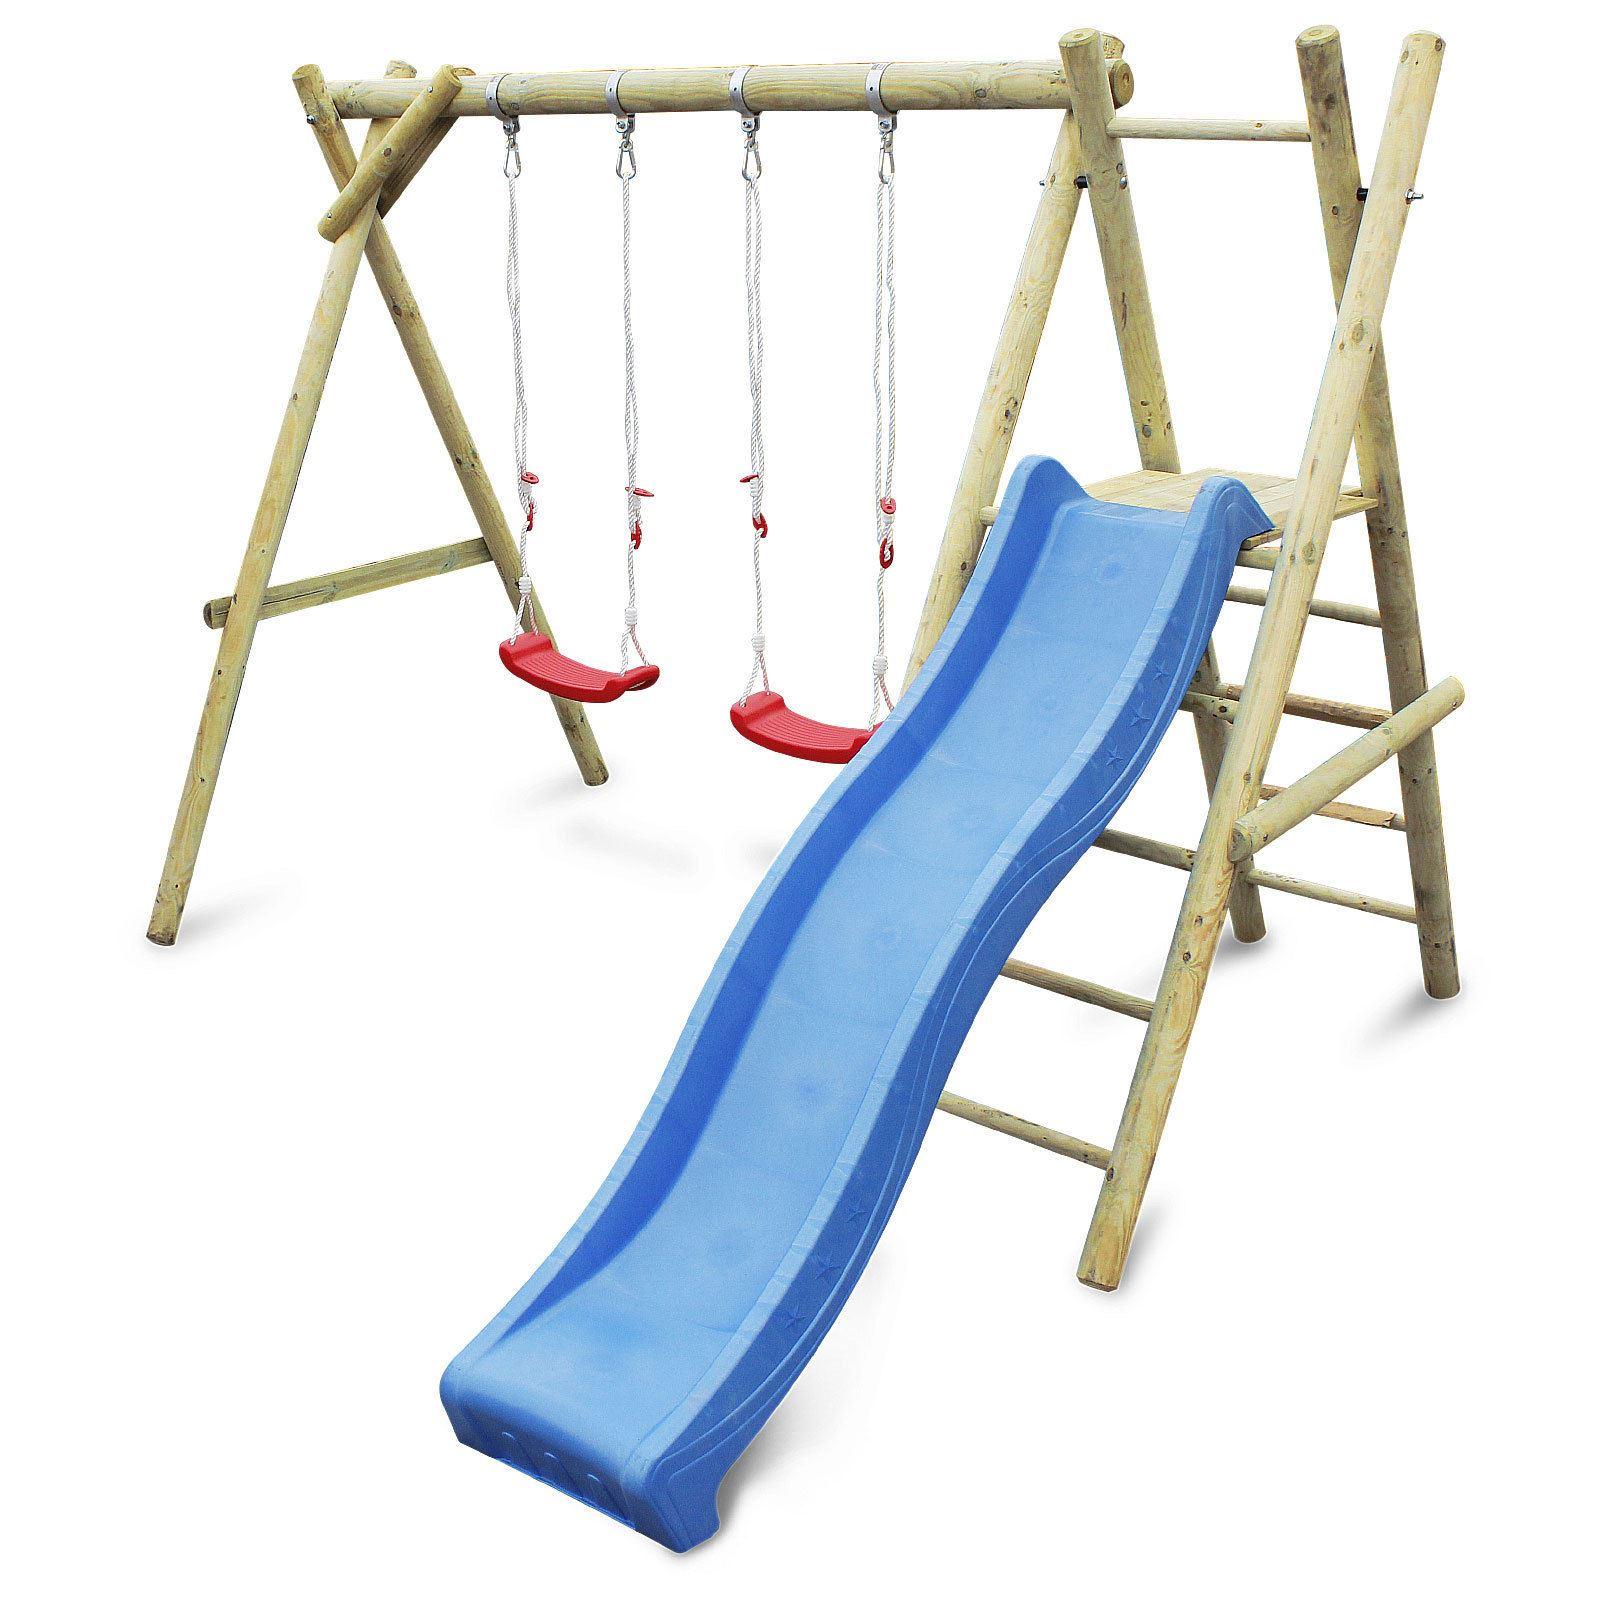 Garten Spielplätze - Gartenspielgeräte